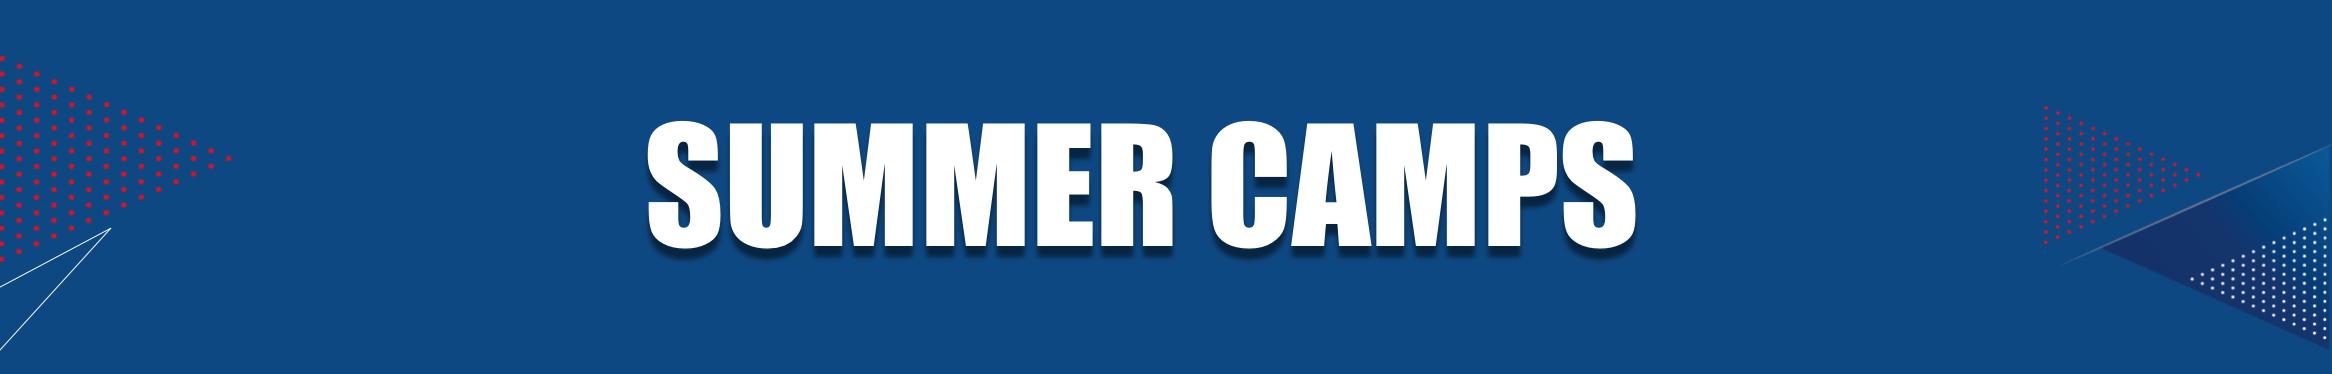 FFA - Header Summer camps